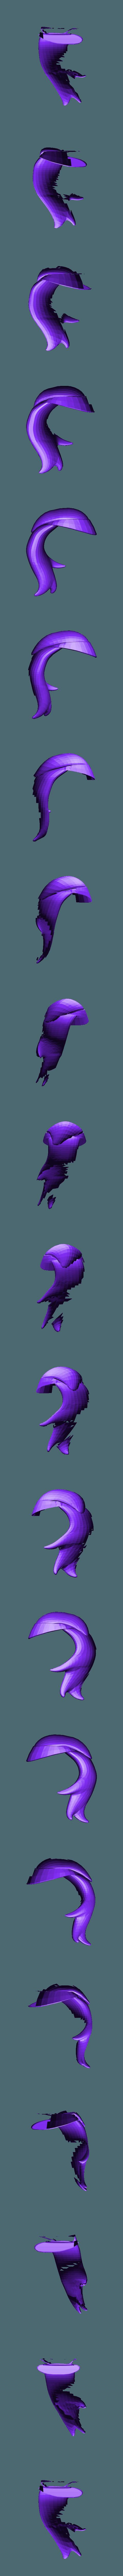 Lotus_criniere_complete.stl Download free STL file MLP Lotus et Aloe Pony • 3D print model, arcandg